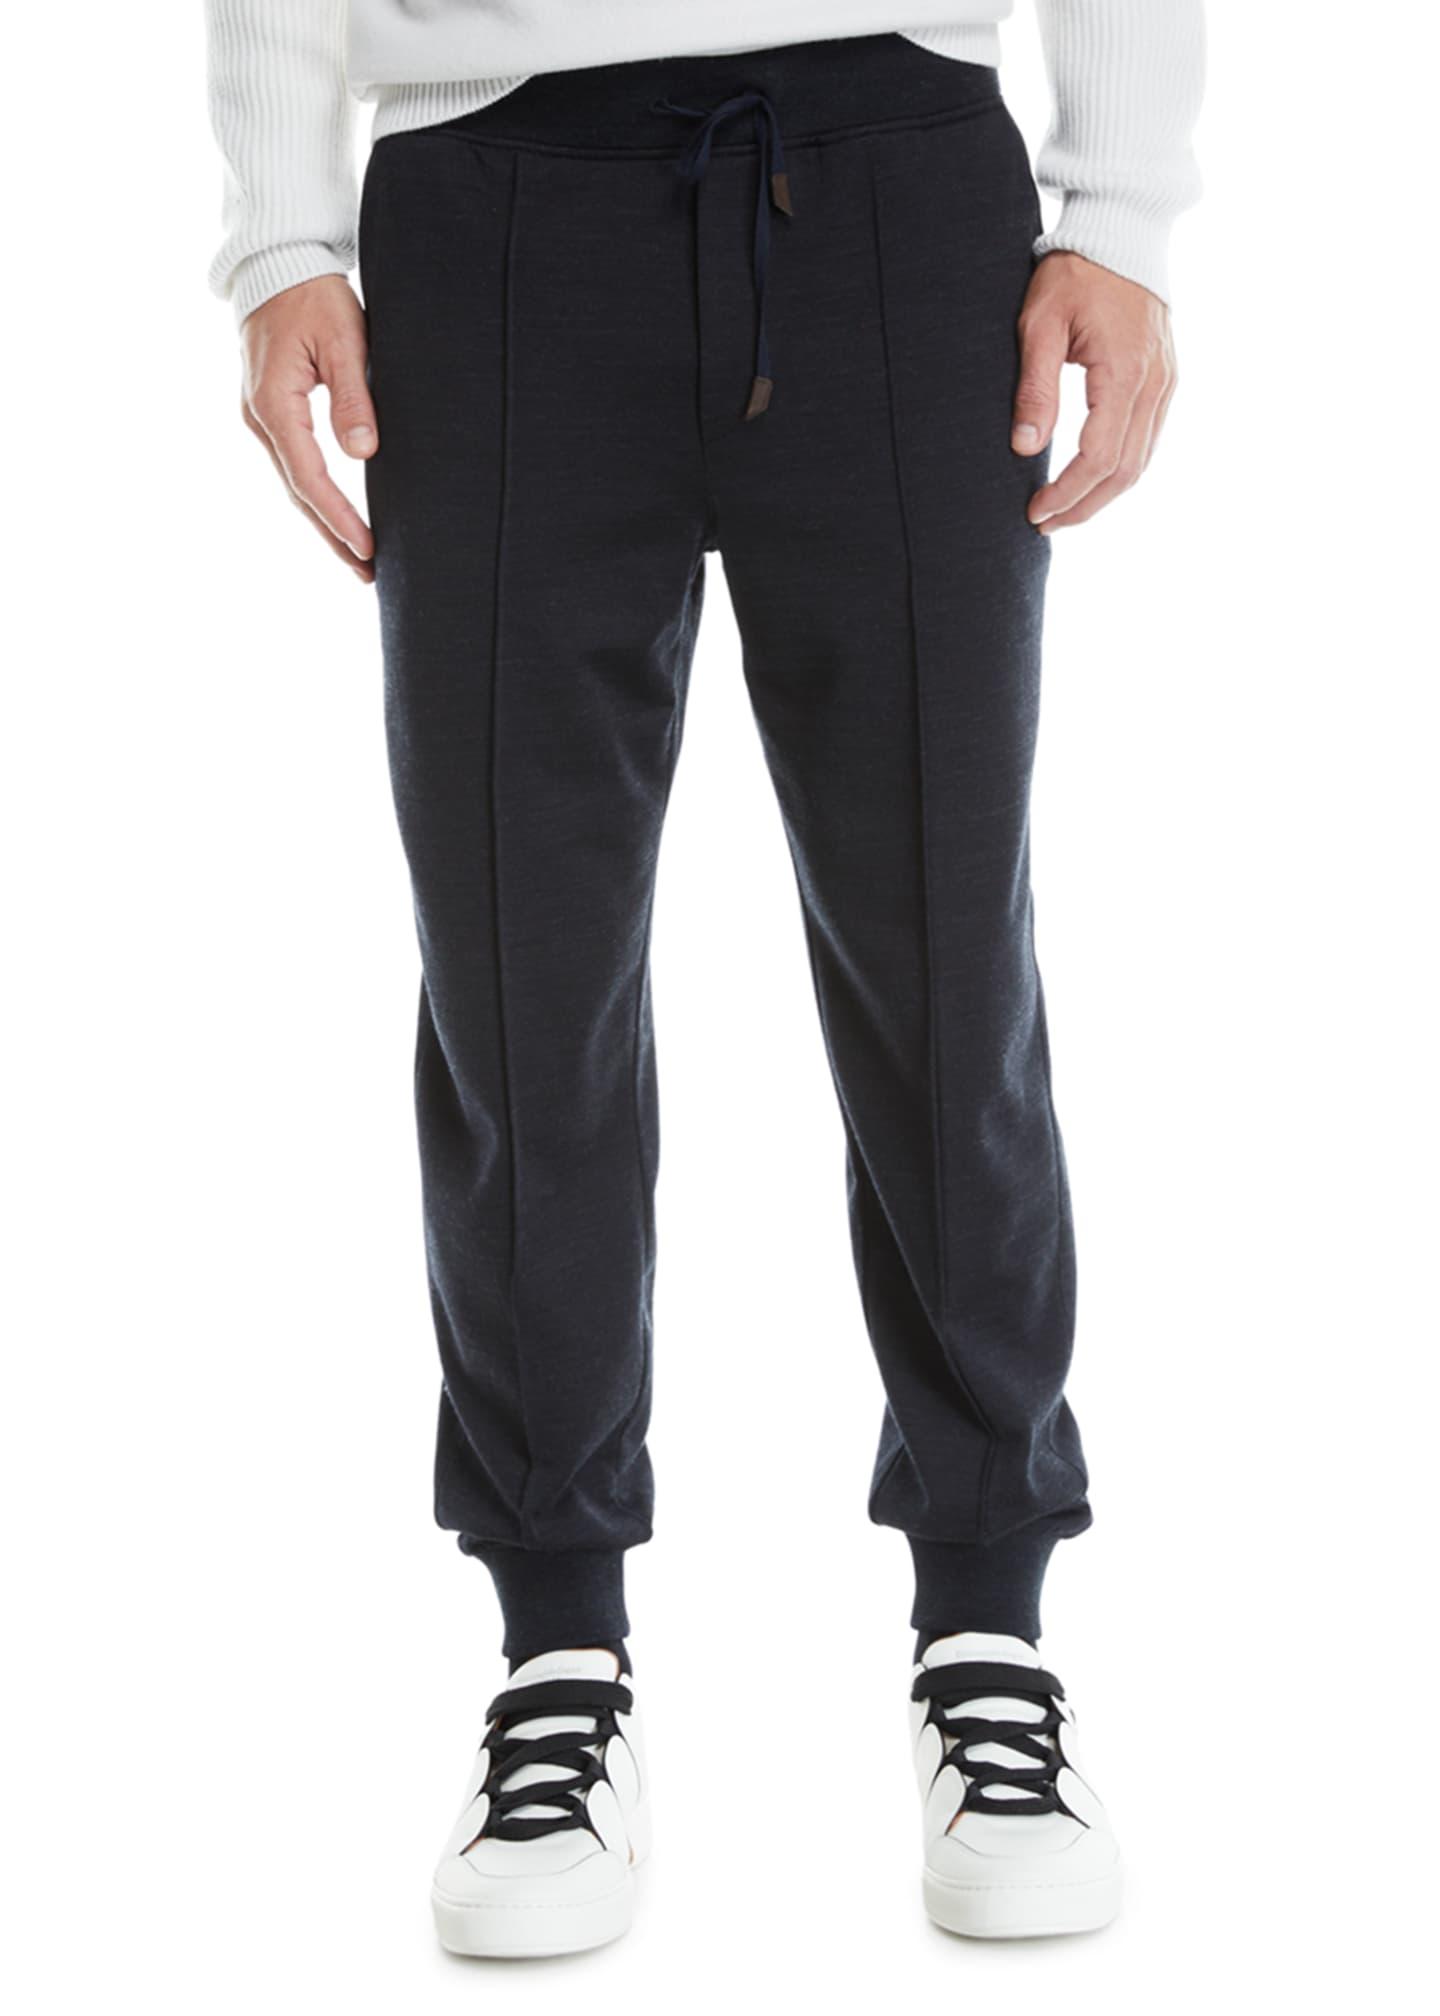 Ermenegildo Zegna Men's Front-Seam Jogger Pants